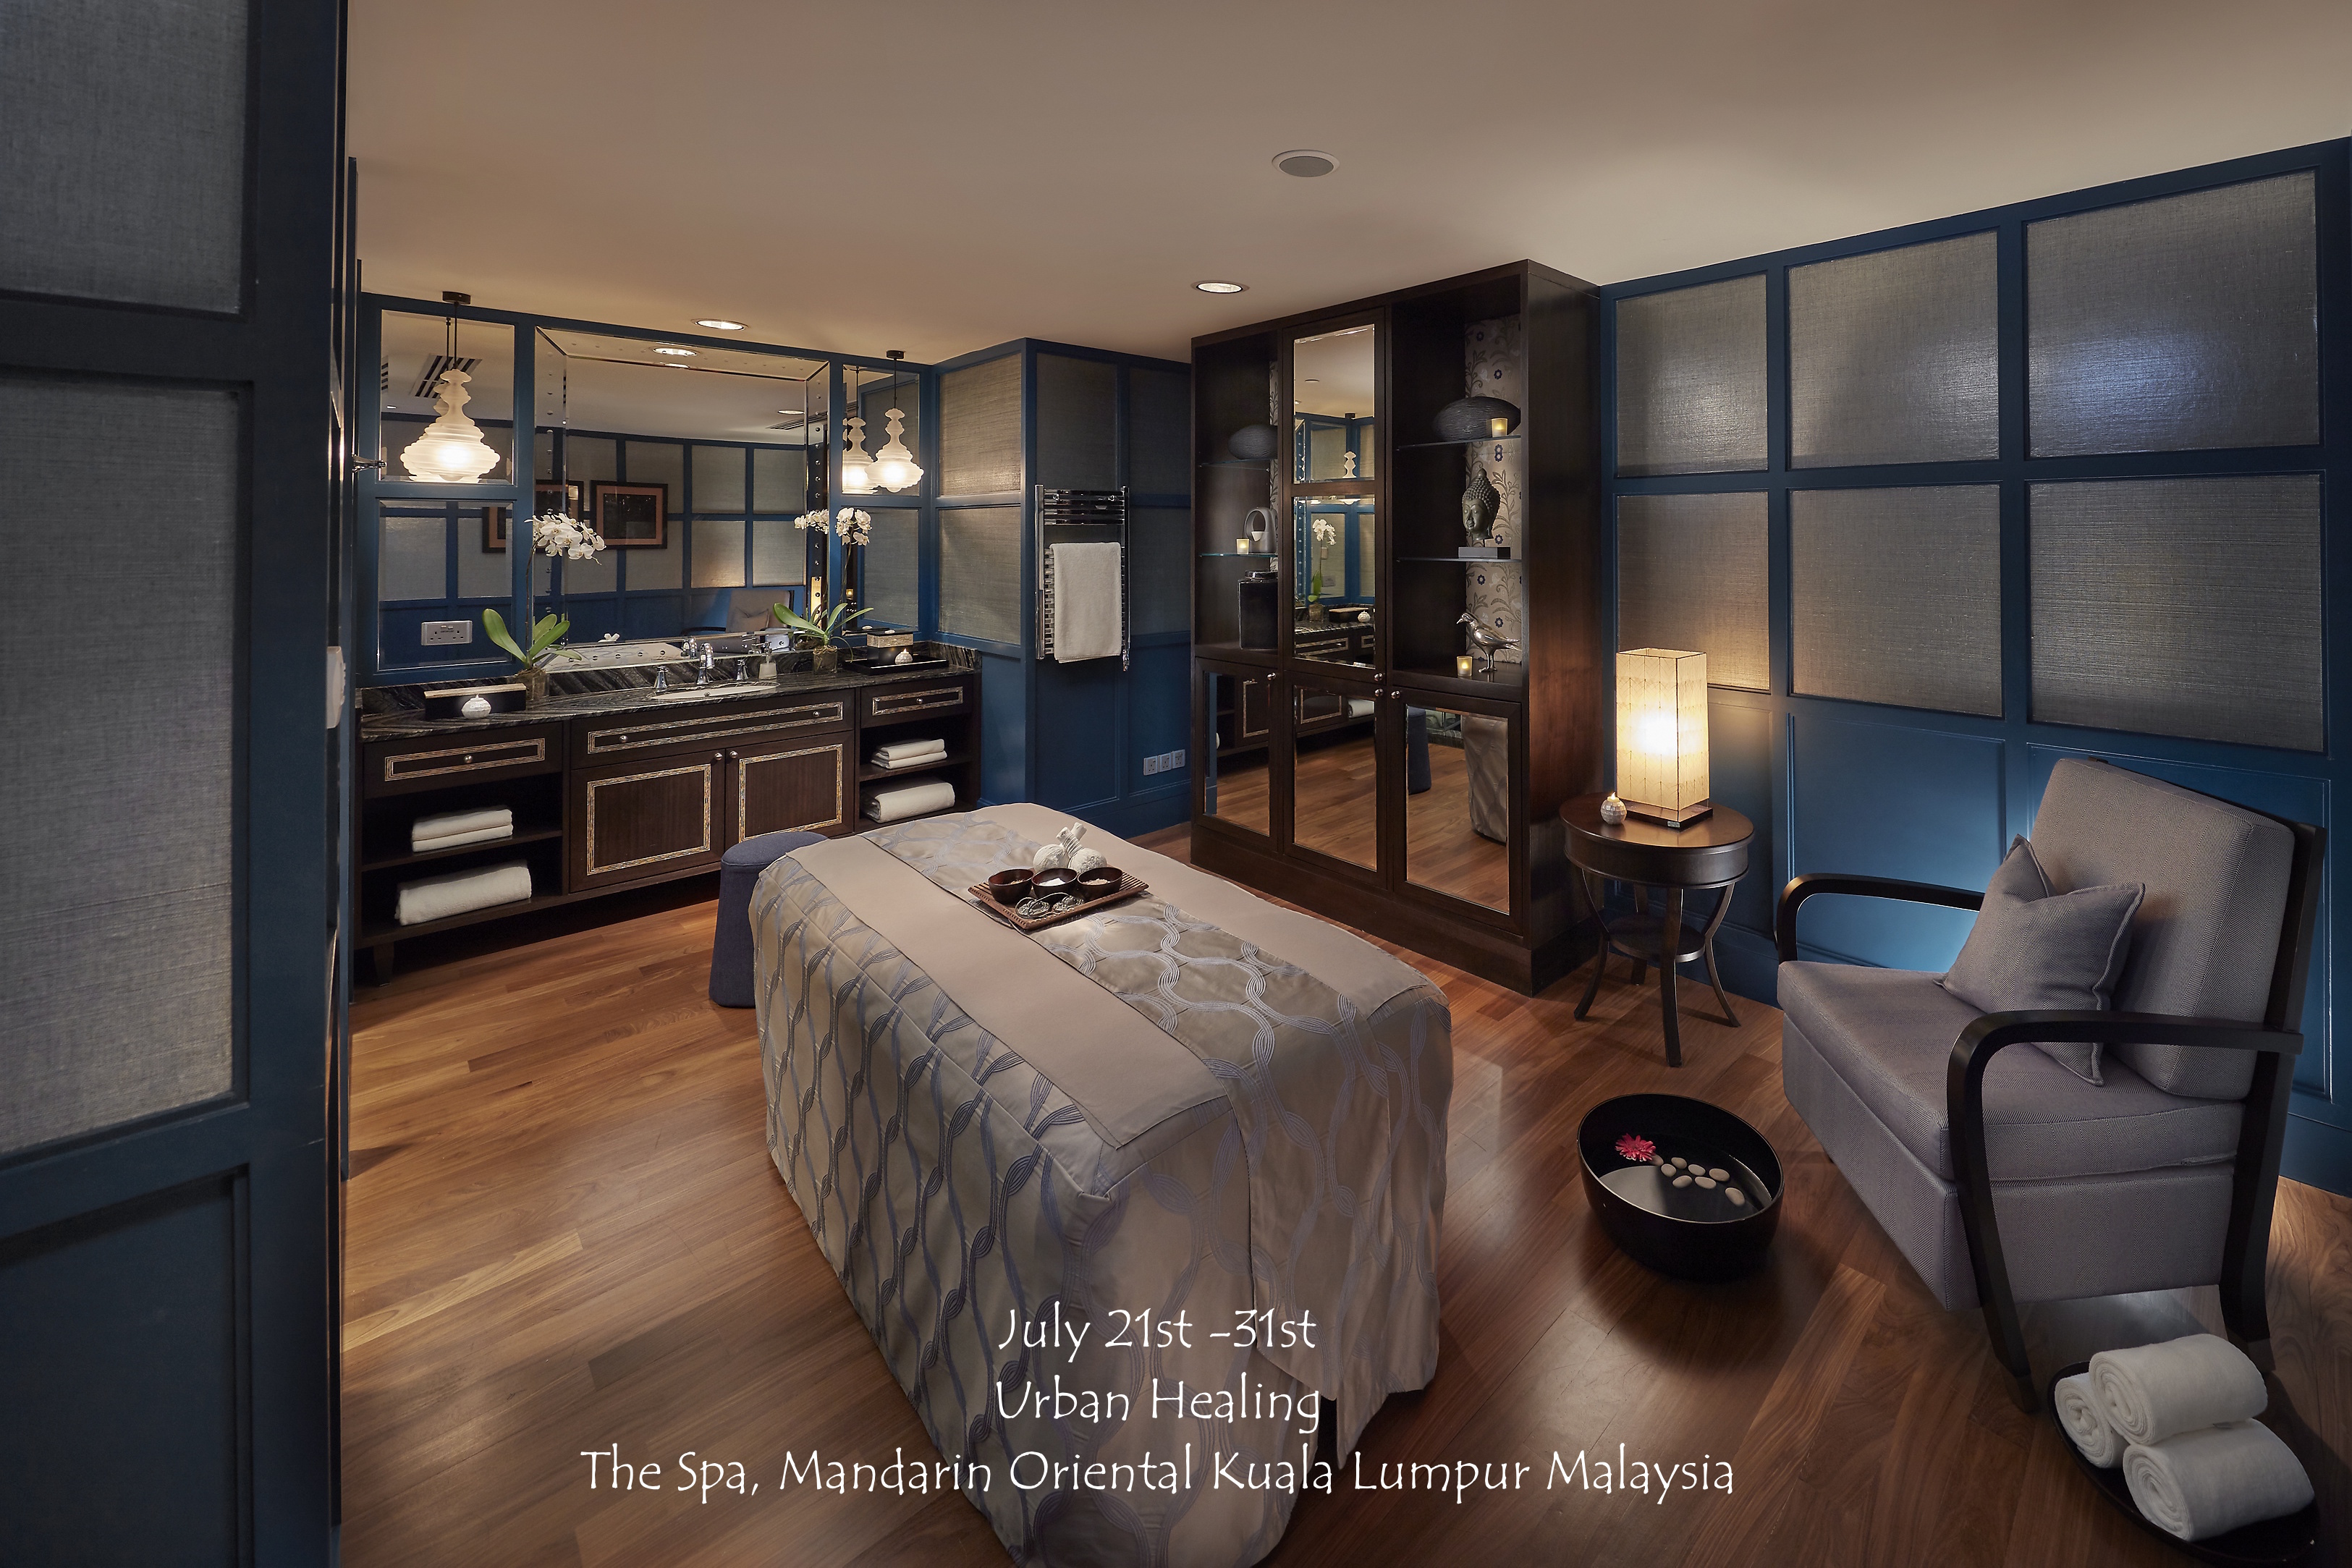 kuala-lumpur-2017-luxury-spa-treatment-room-01 copy